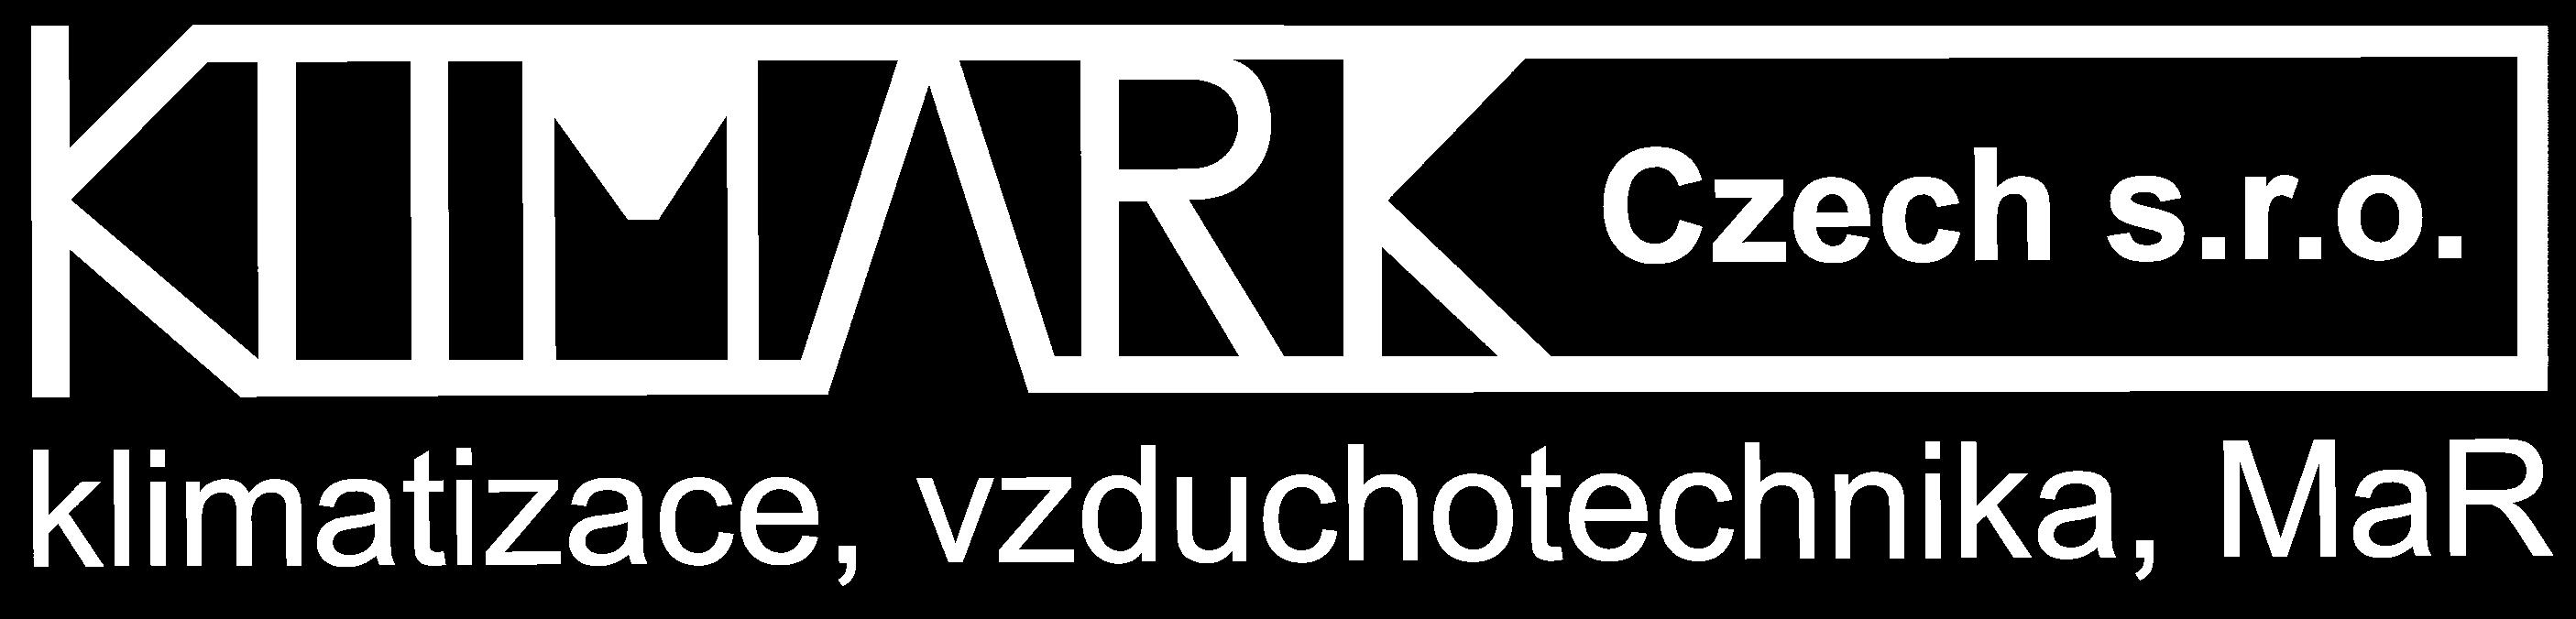 Klimark Czech